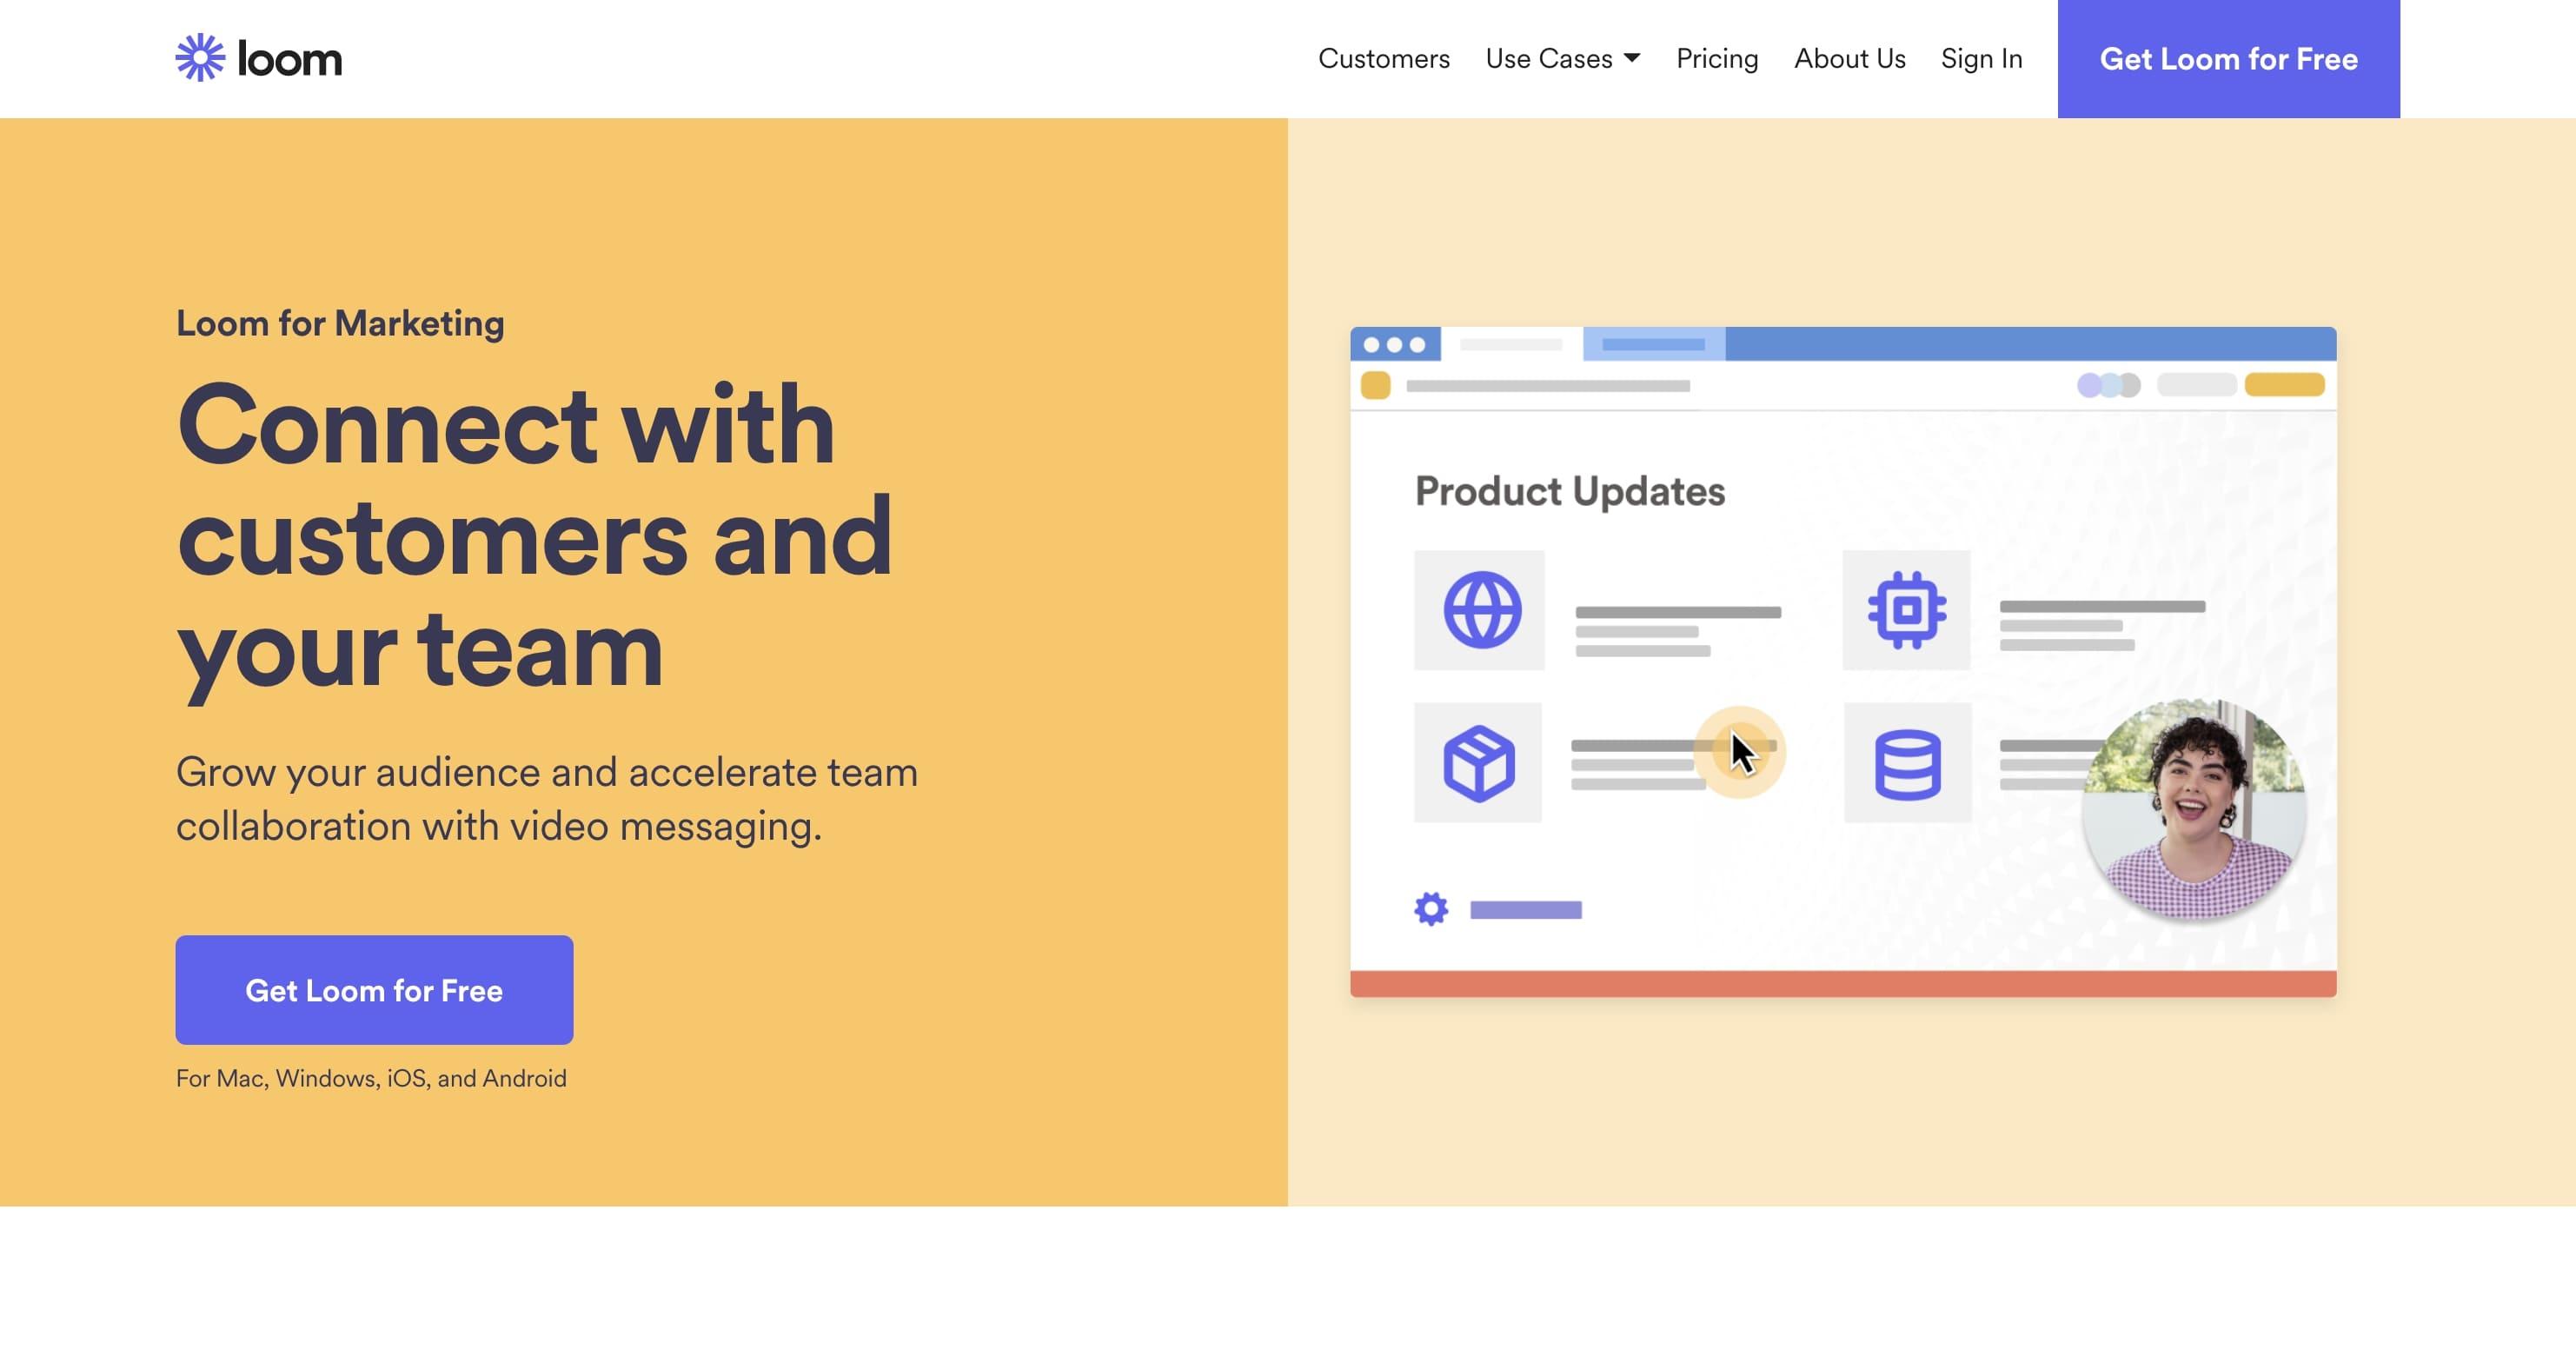 loom marketing use case page